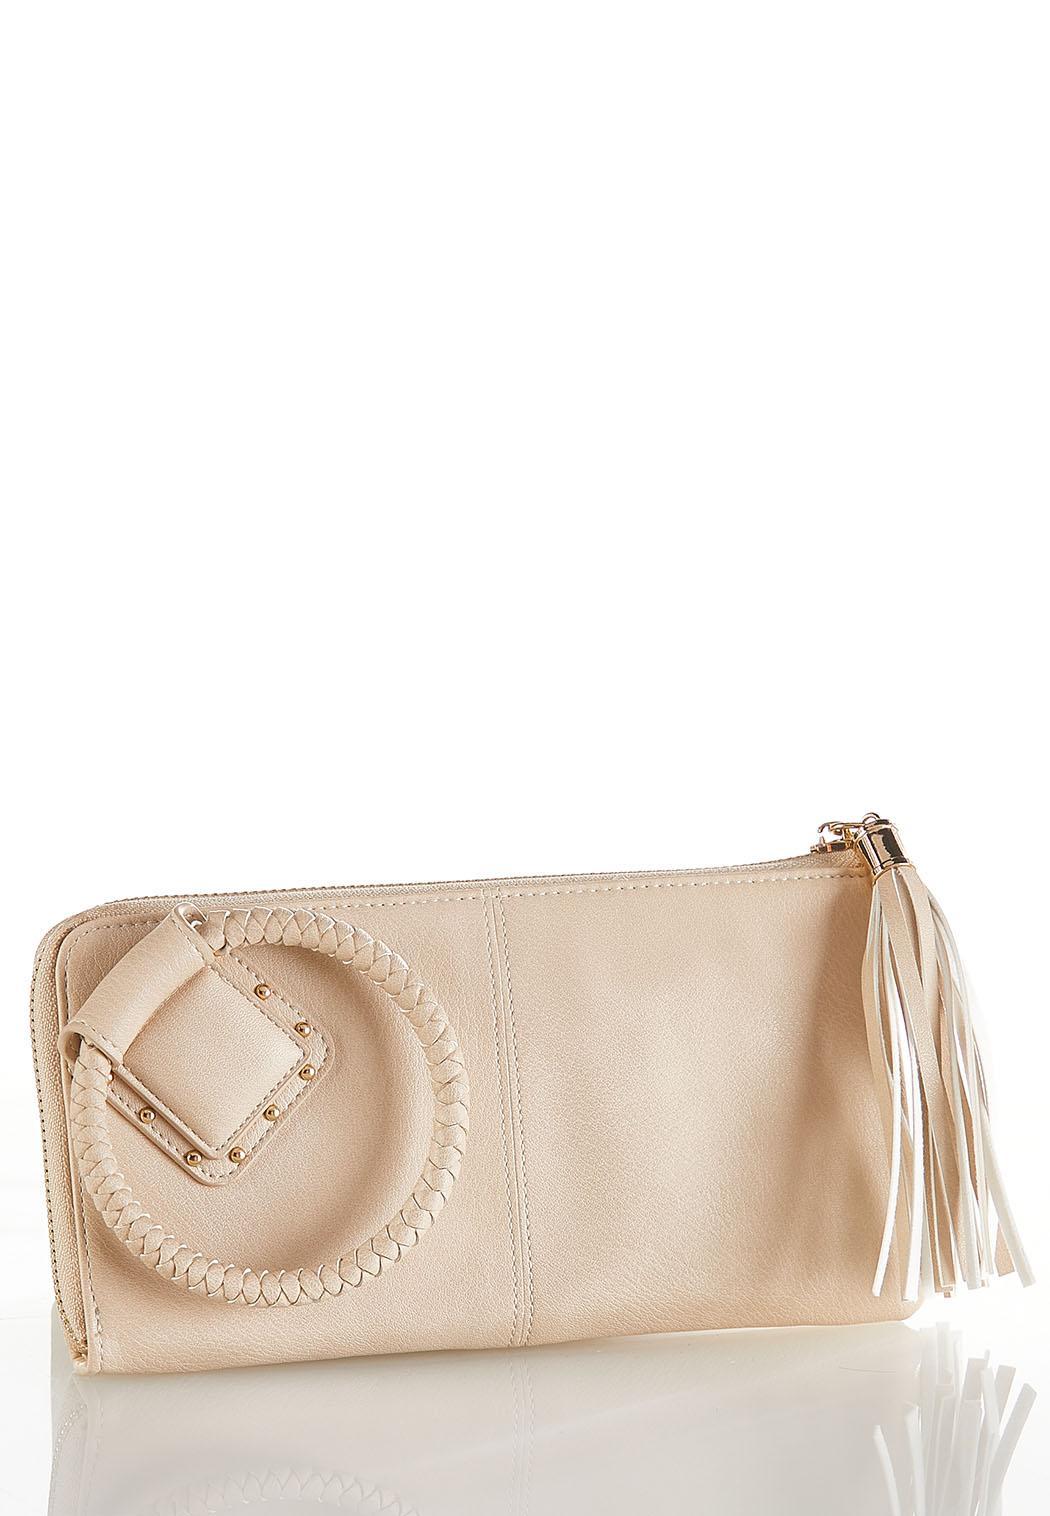 Braided Handle Wristlet Wallet